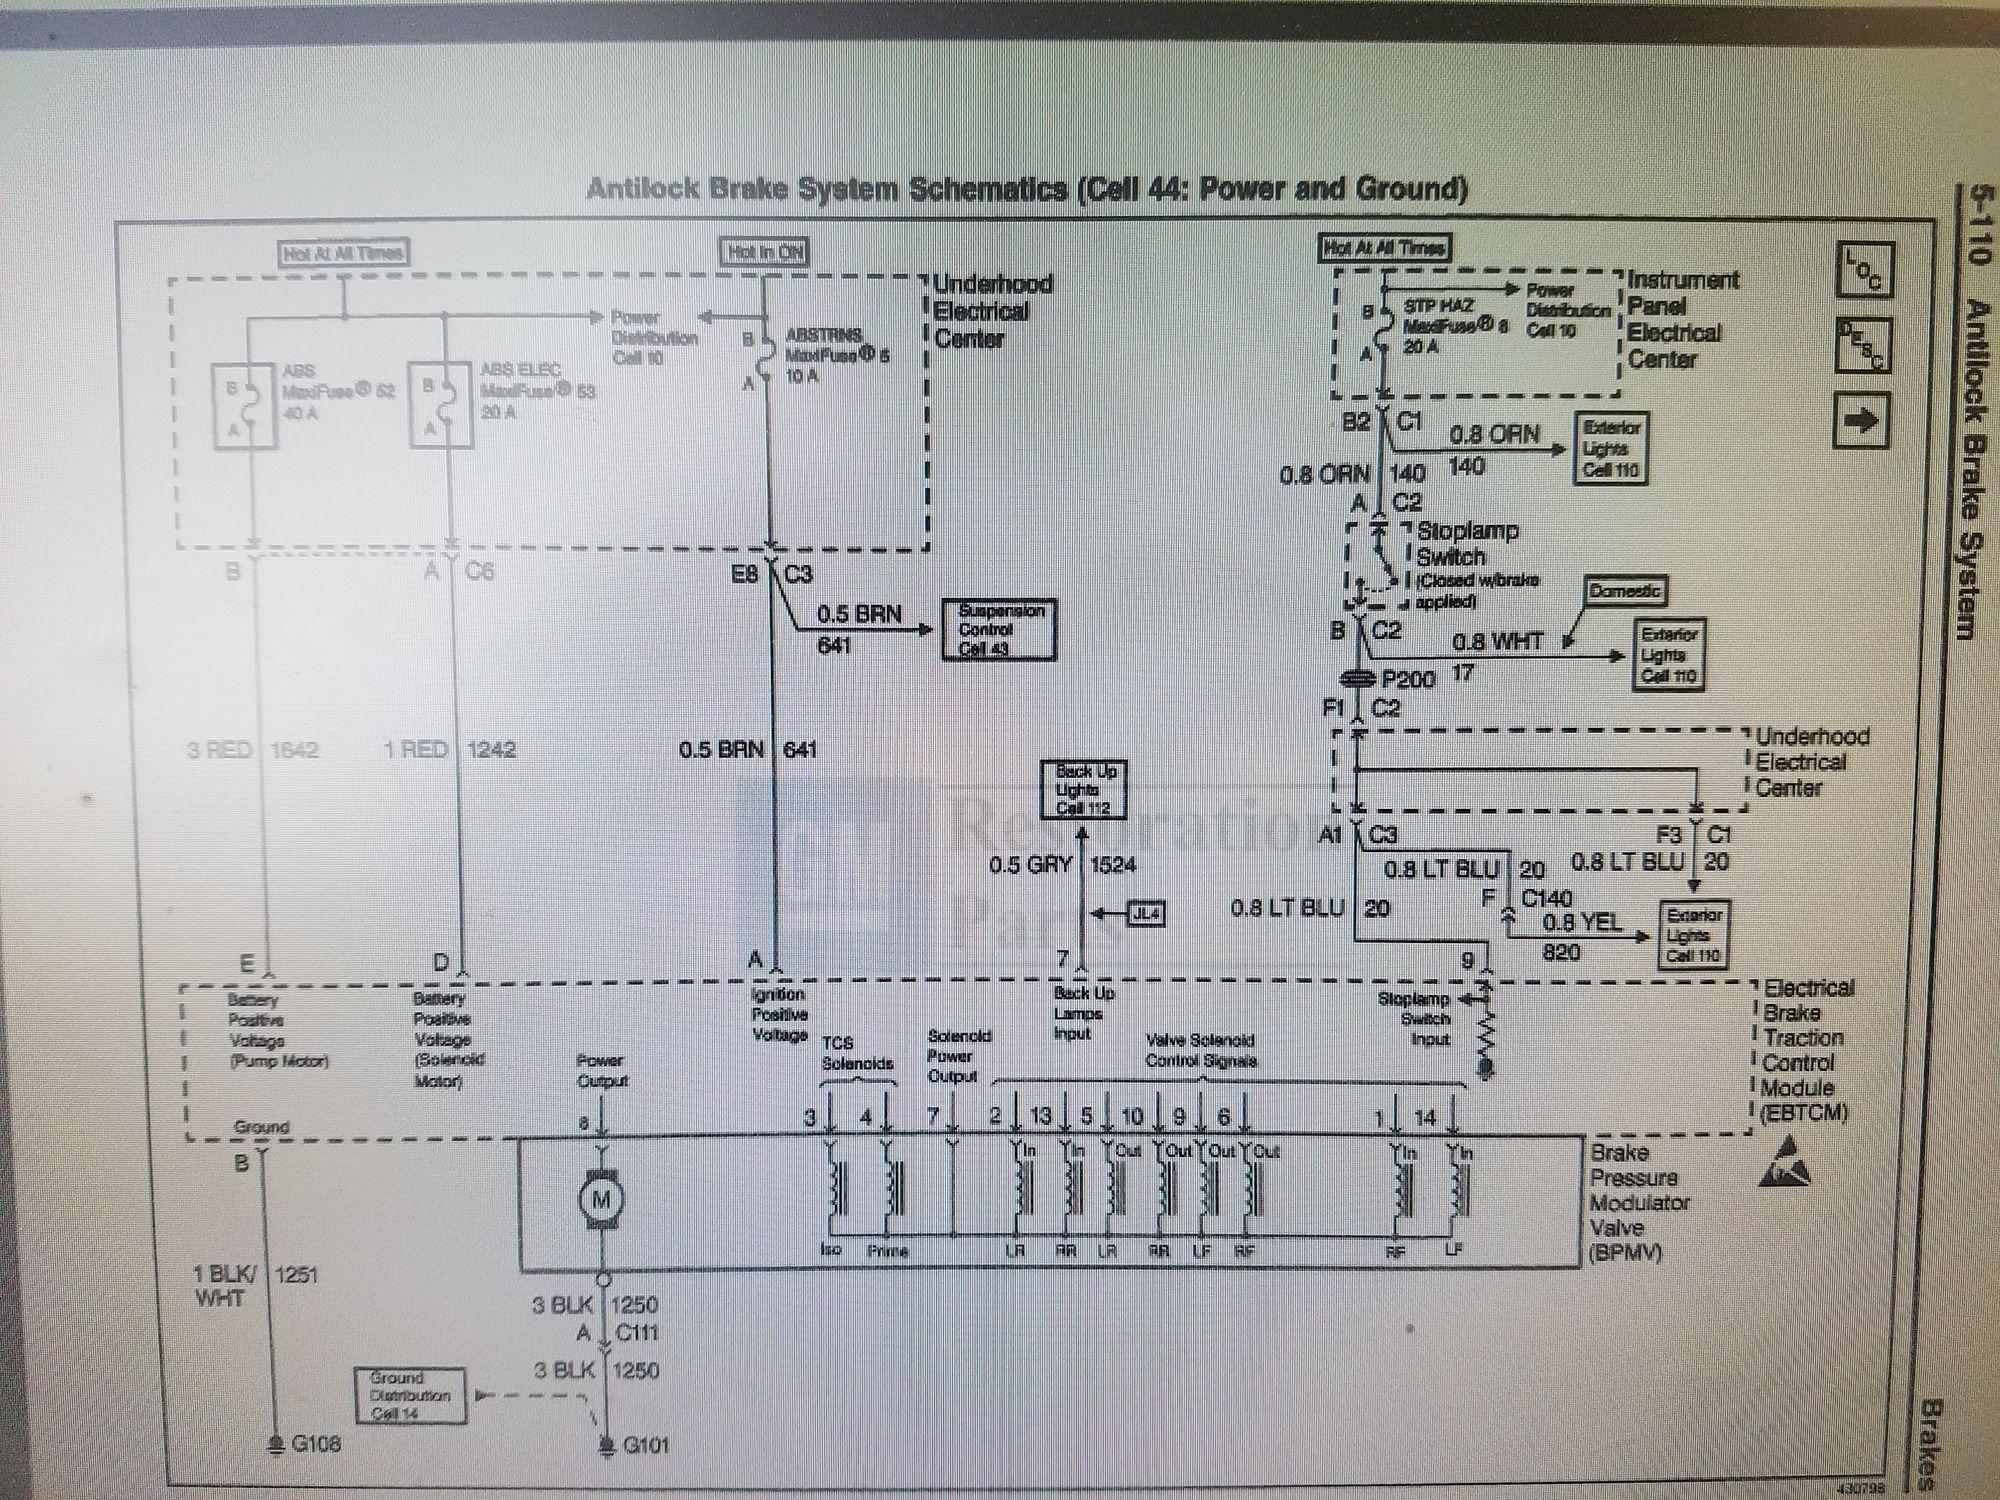 Atemberaubend Ddec V Schaltplan Ideen - Elektrische Schaltplan-Ideen ...